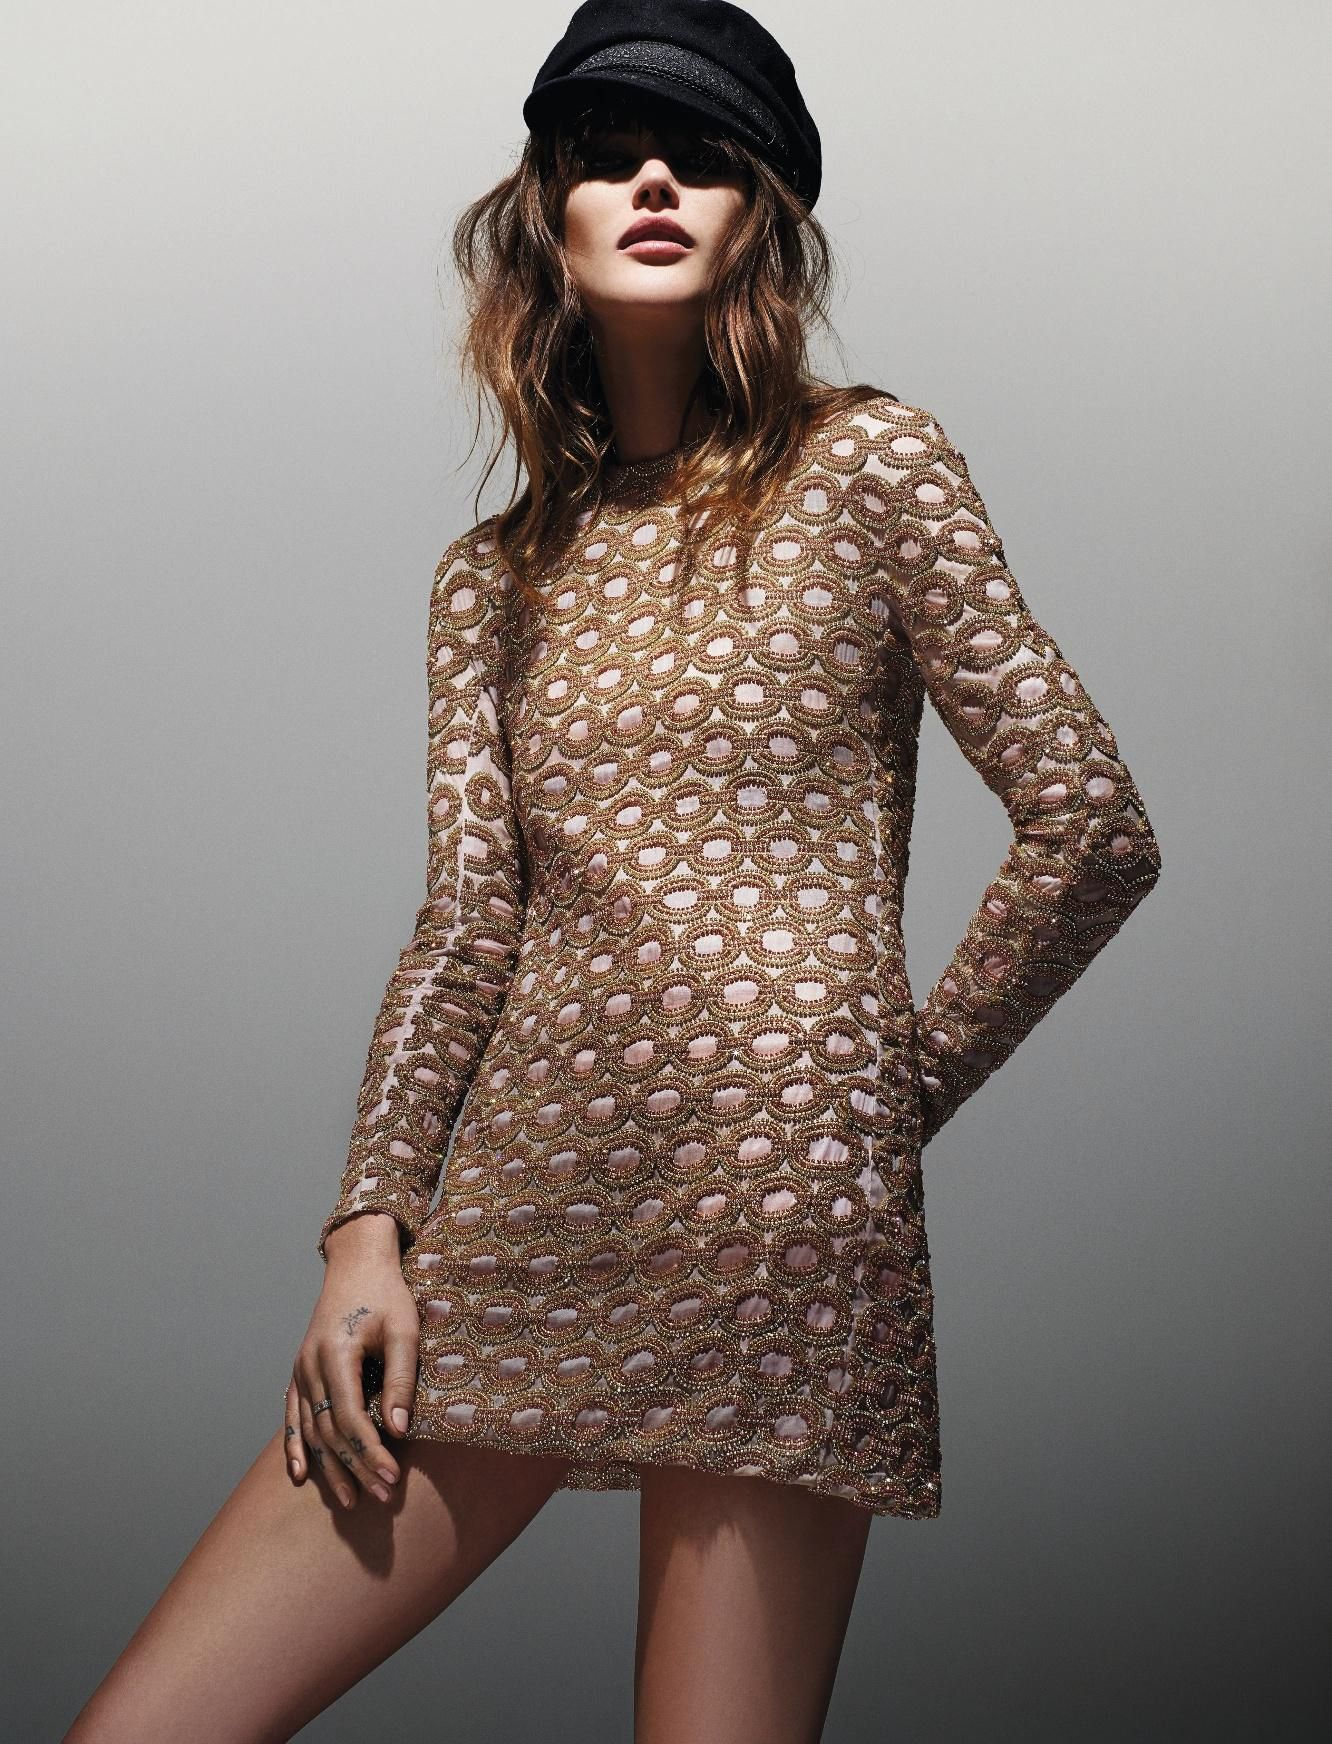 Catherine McNeil by Jean-Baptiste Mondino for Elle France March 2015 4